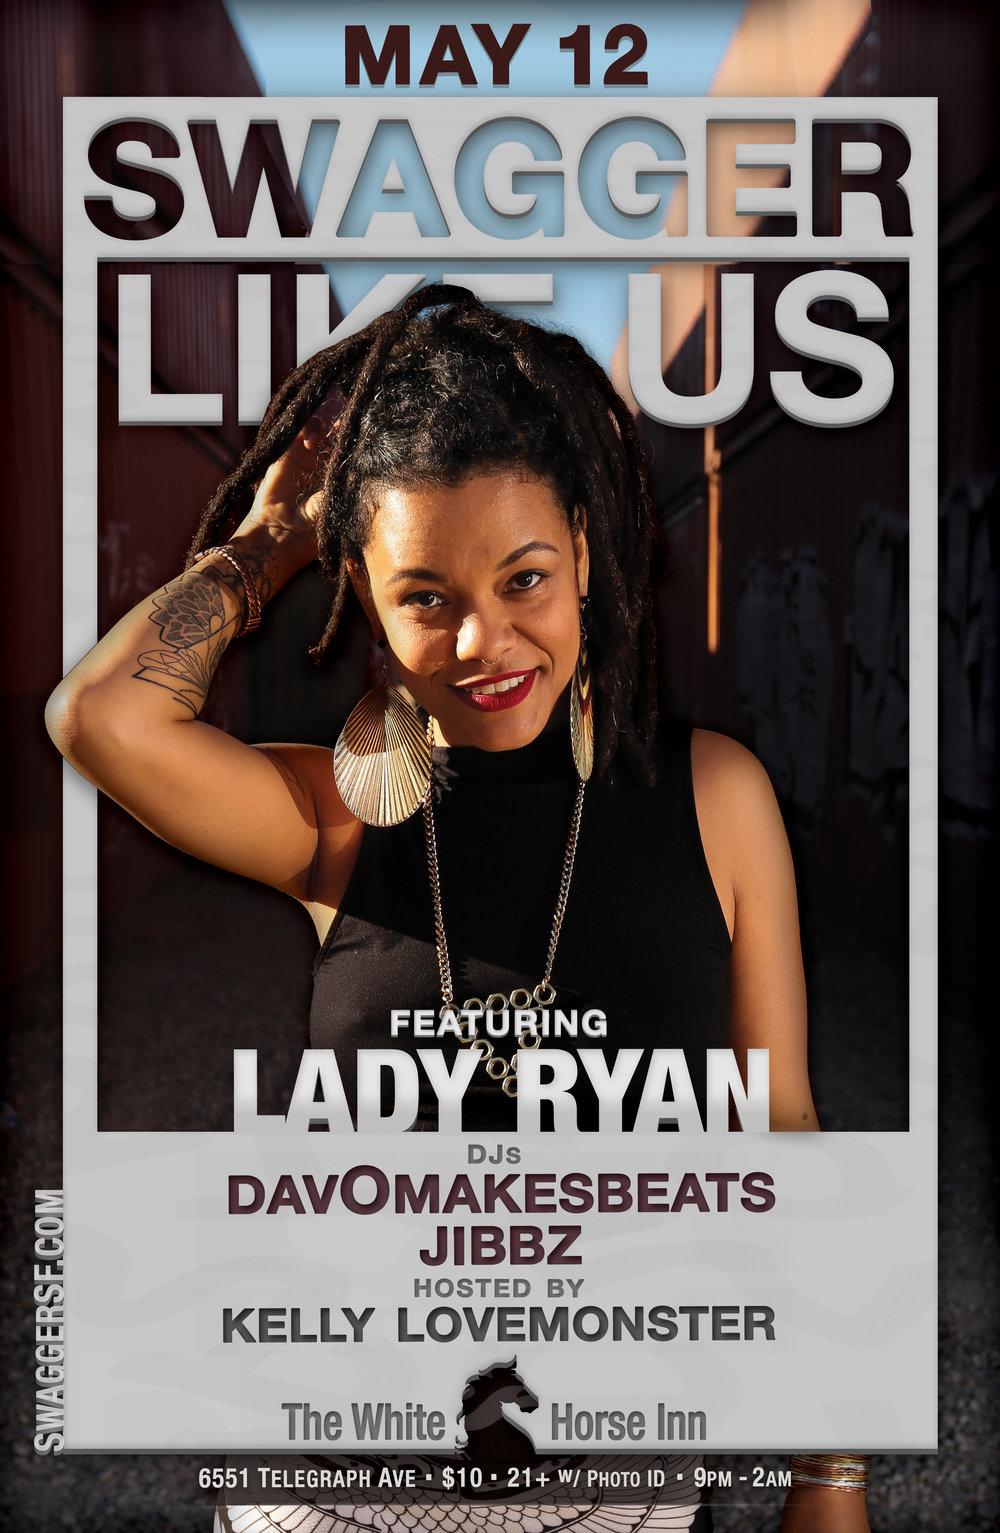 SLU-2017-05-12-LadyRyan.jpg